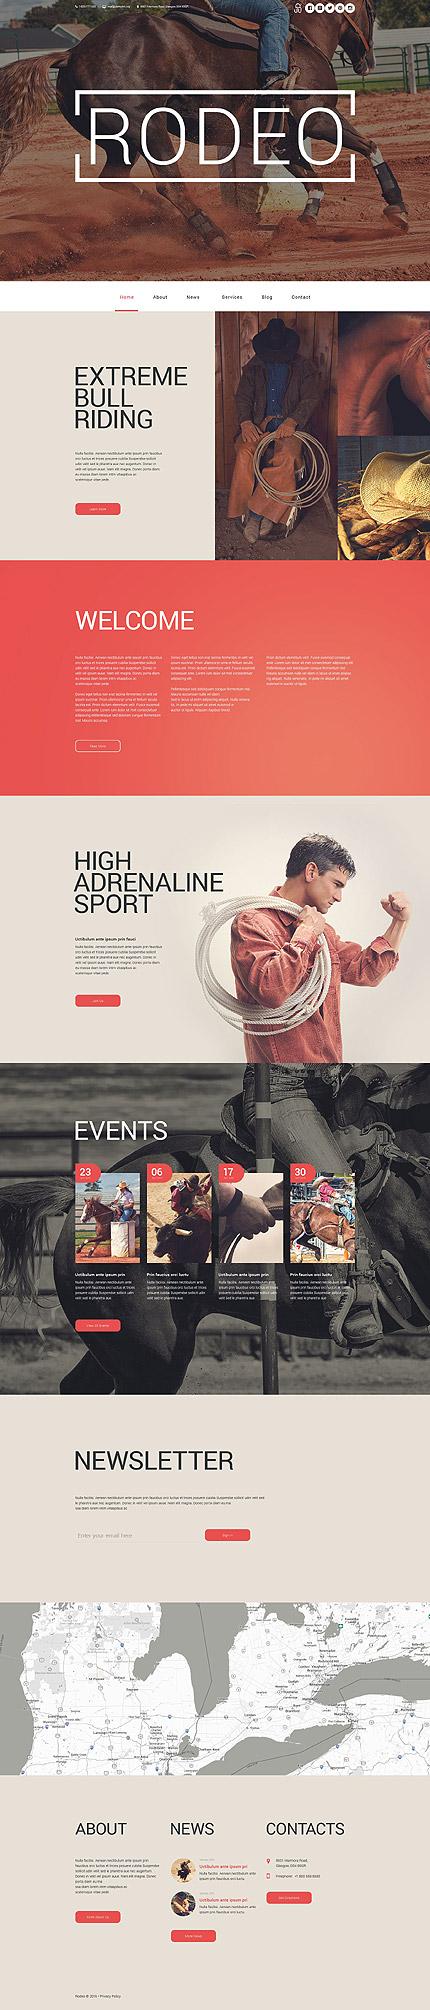 Premium Rodeo Arena WordPress Template